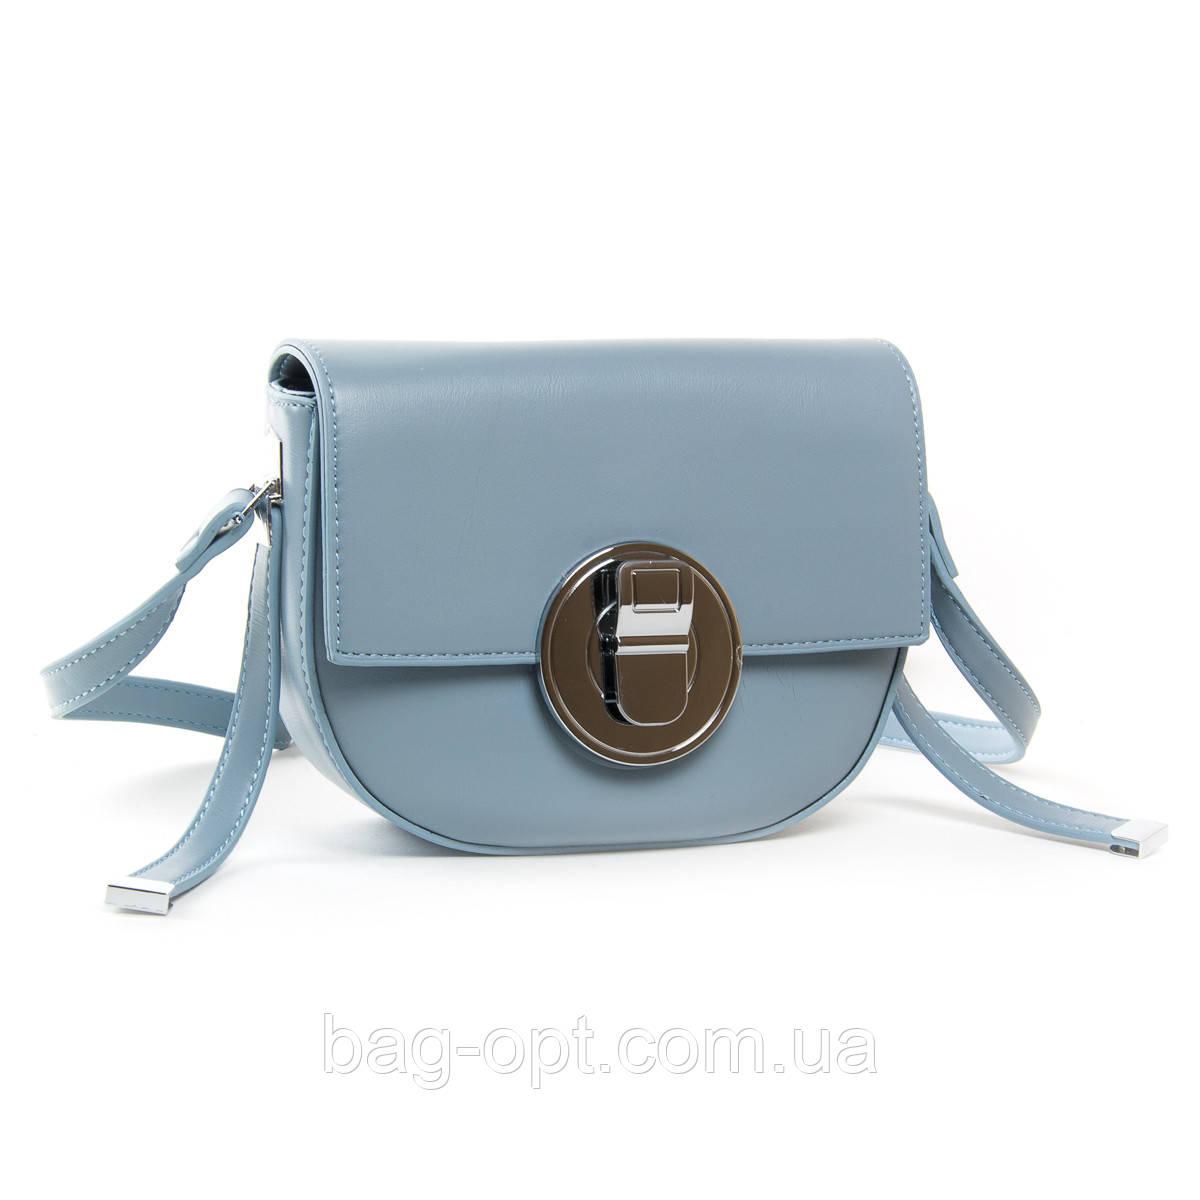 Клатч женский Fashion (19x16x7 см) blue